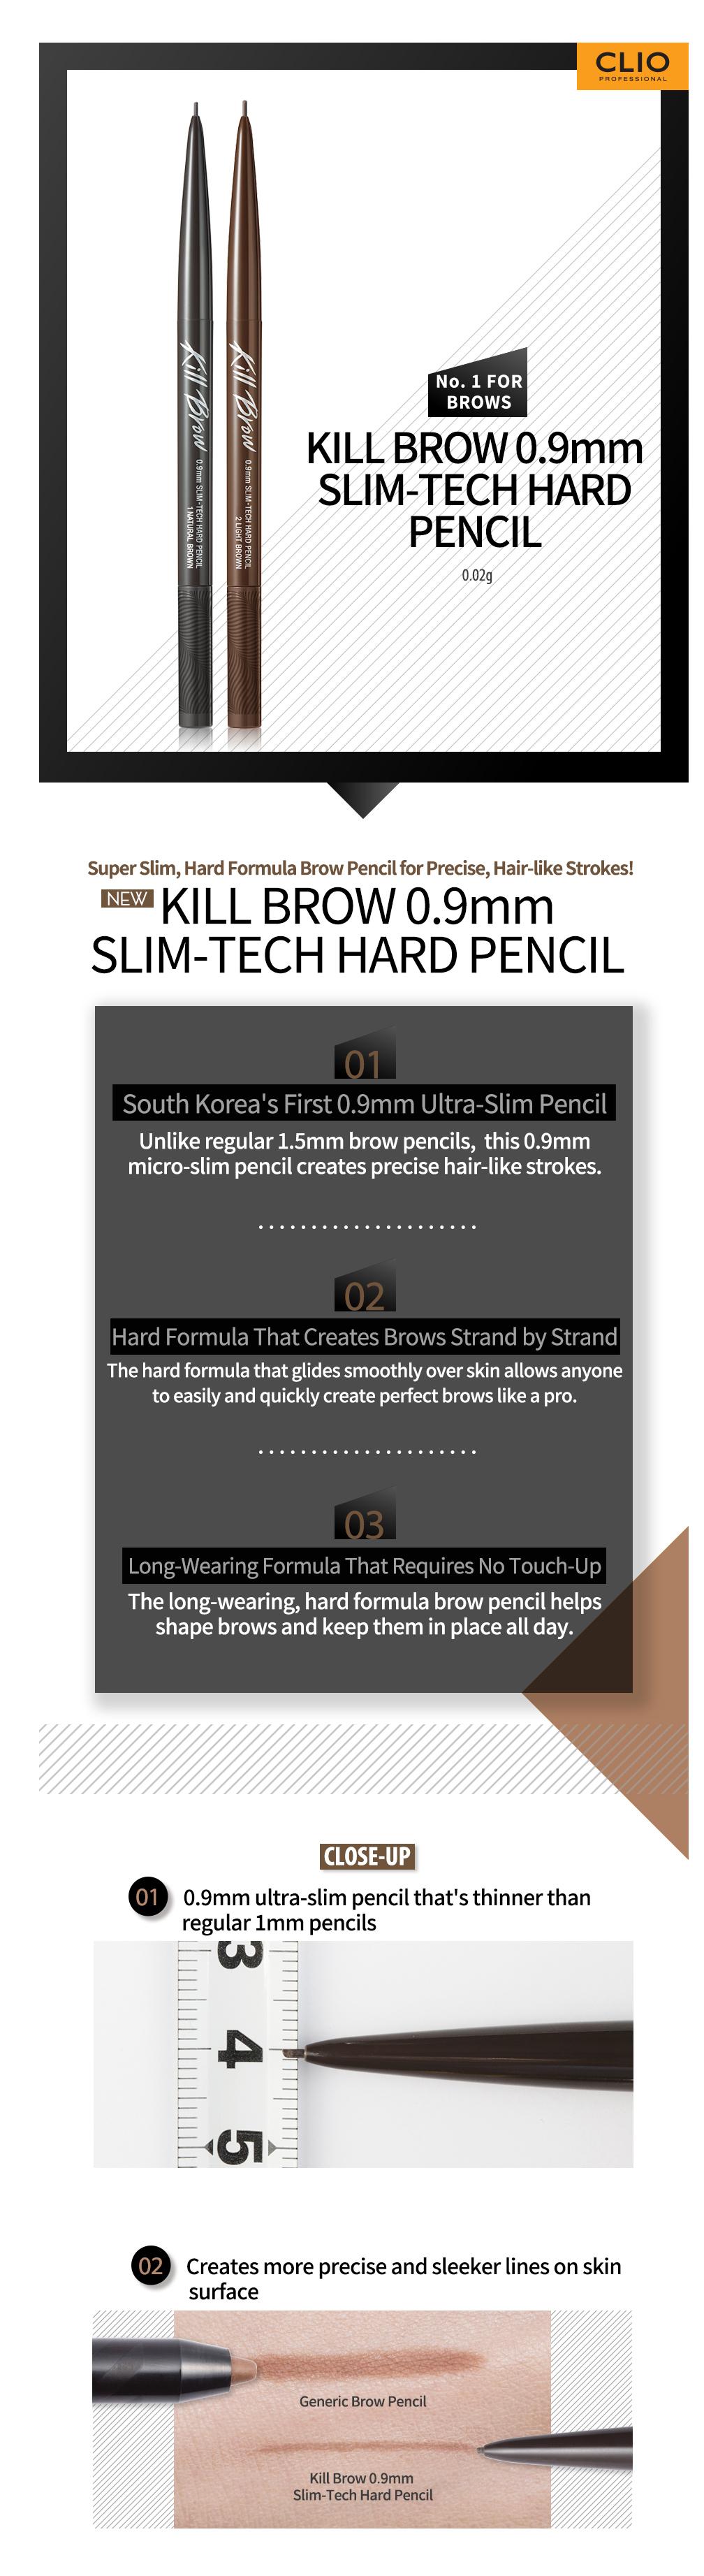 clio-kill-brow-0.9mm-slim-tech-hard-pencil1.jpg